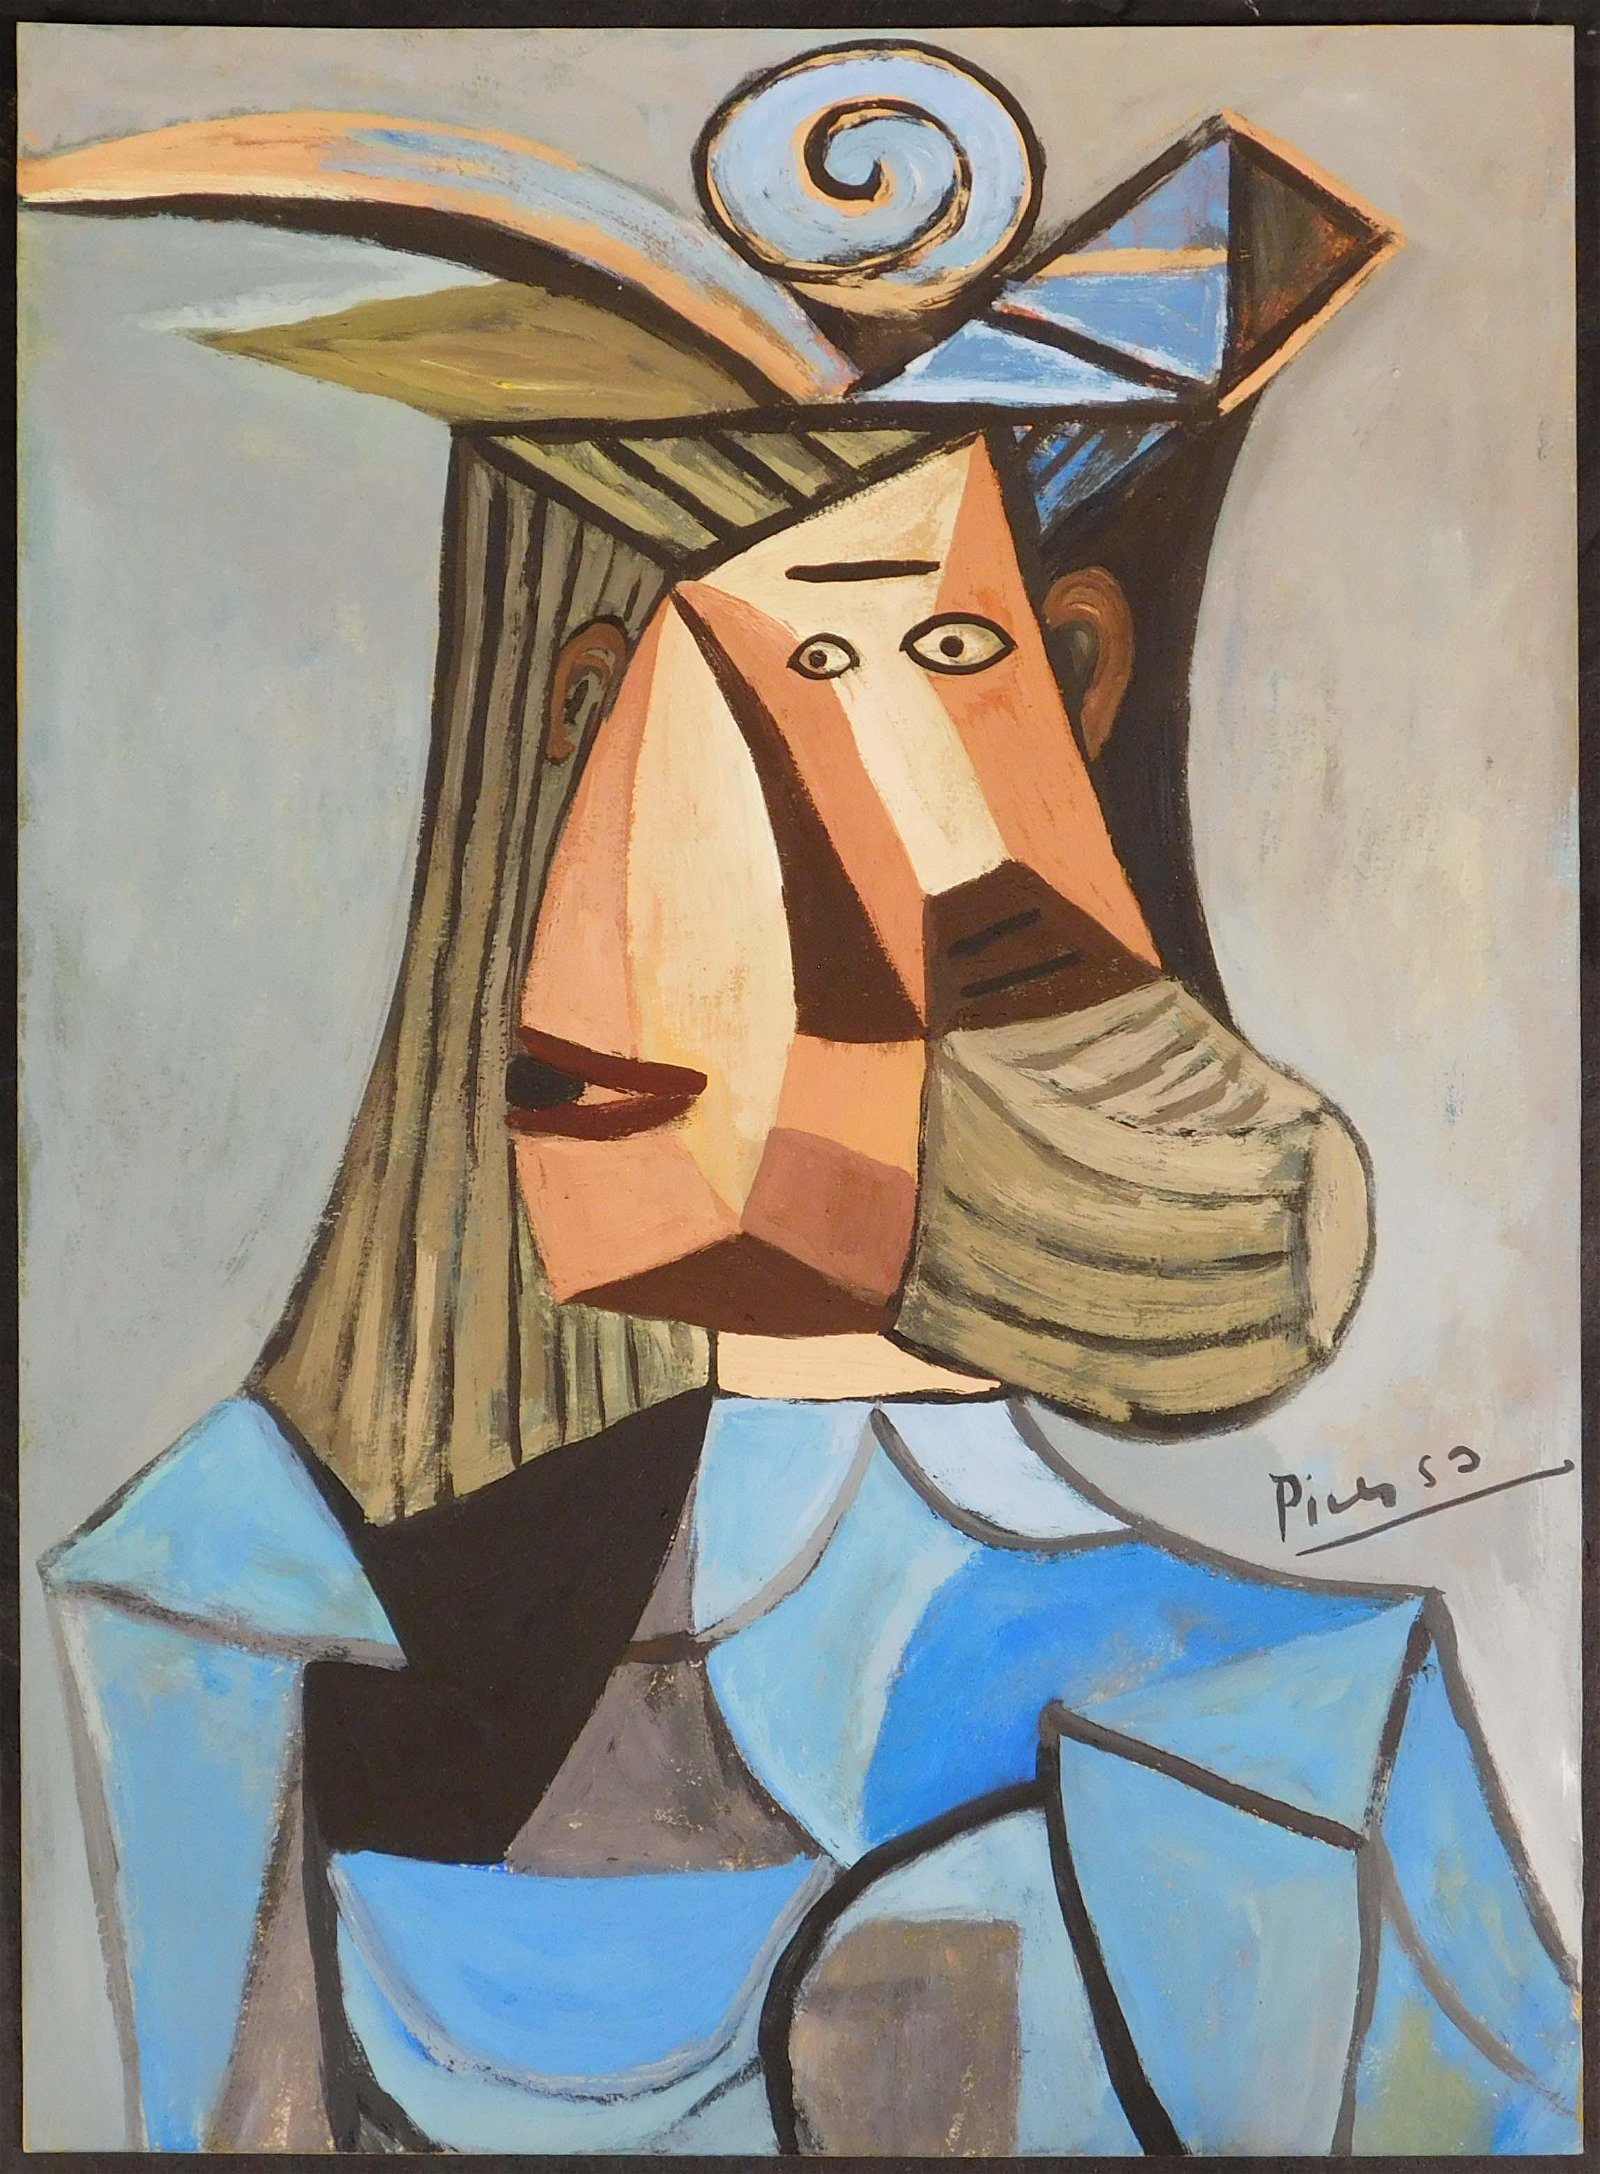 Pablo Picasso, Manner of: Dora Maar